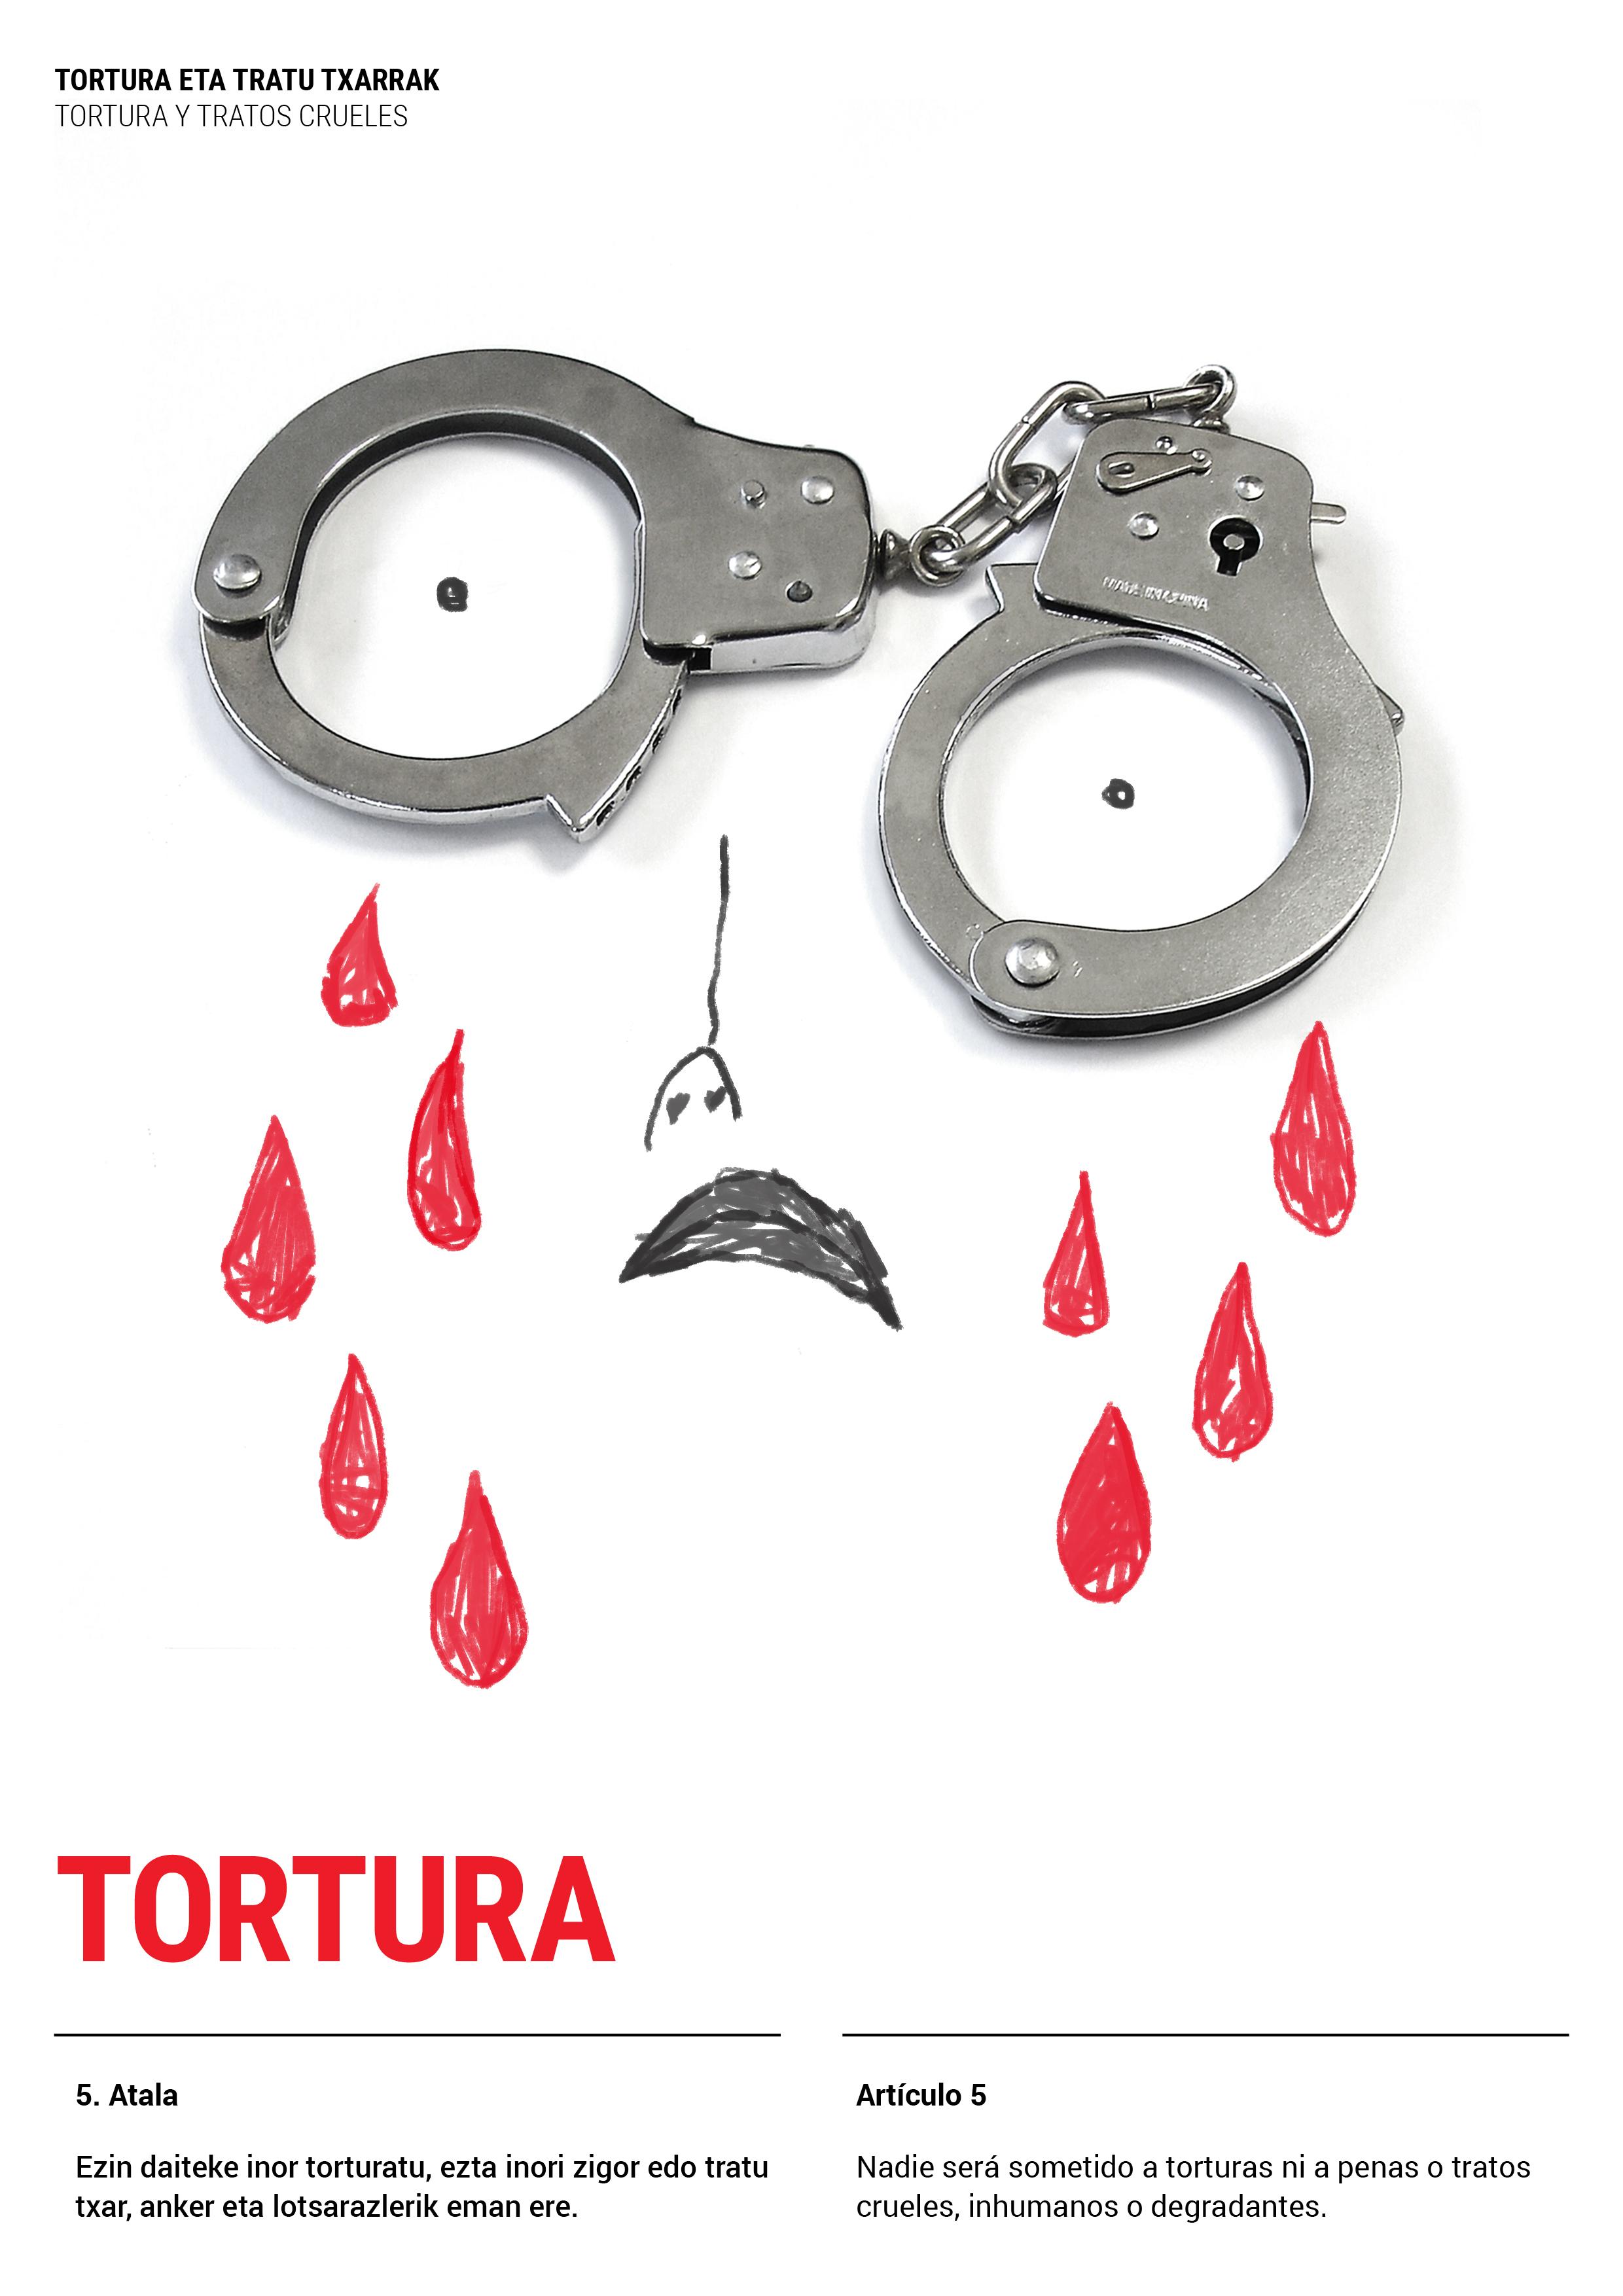 Cartel Tortura. Exposición Derechos Humanos  by Nagore M. Jauregi - Creative Work